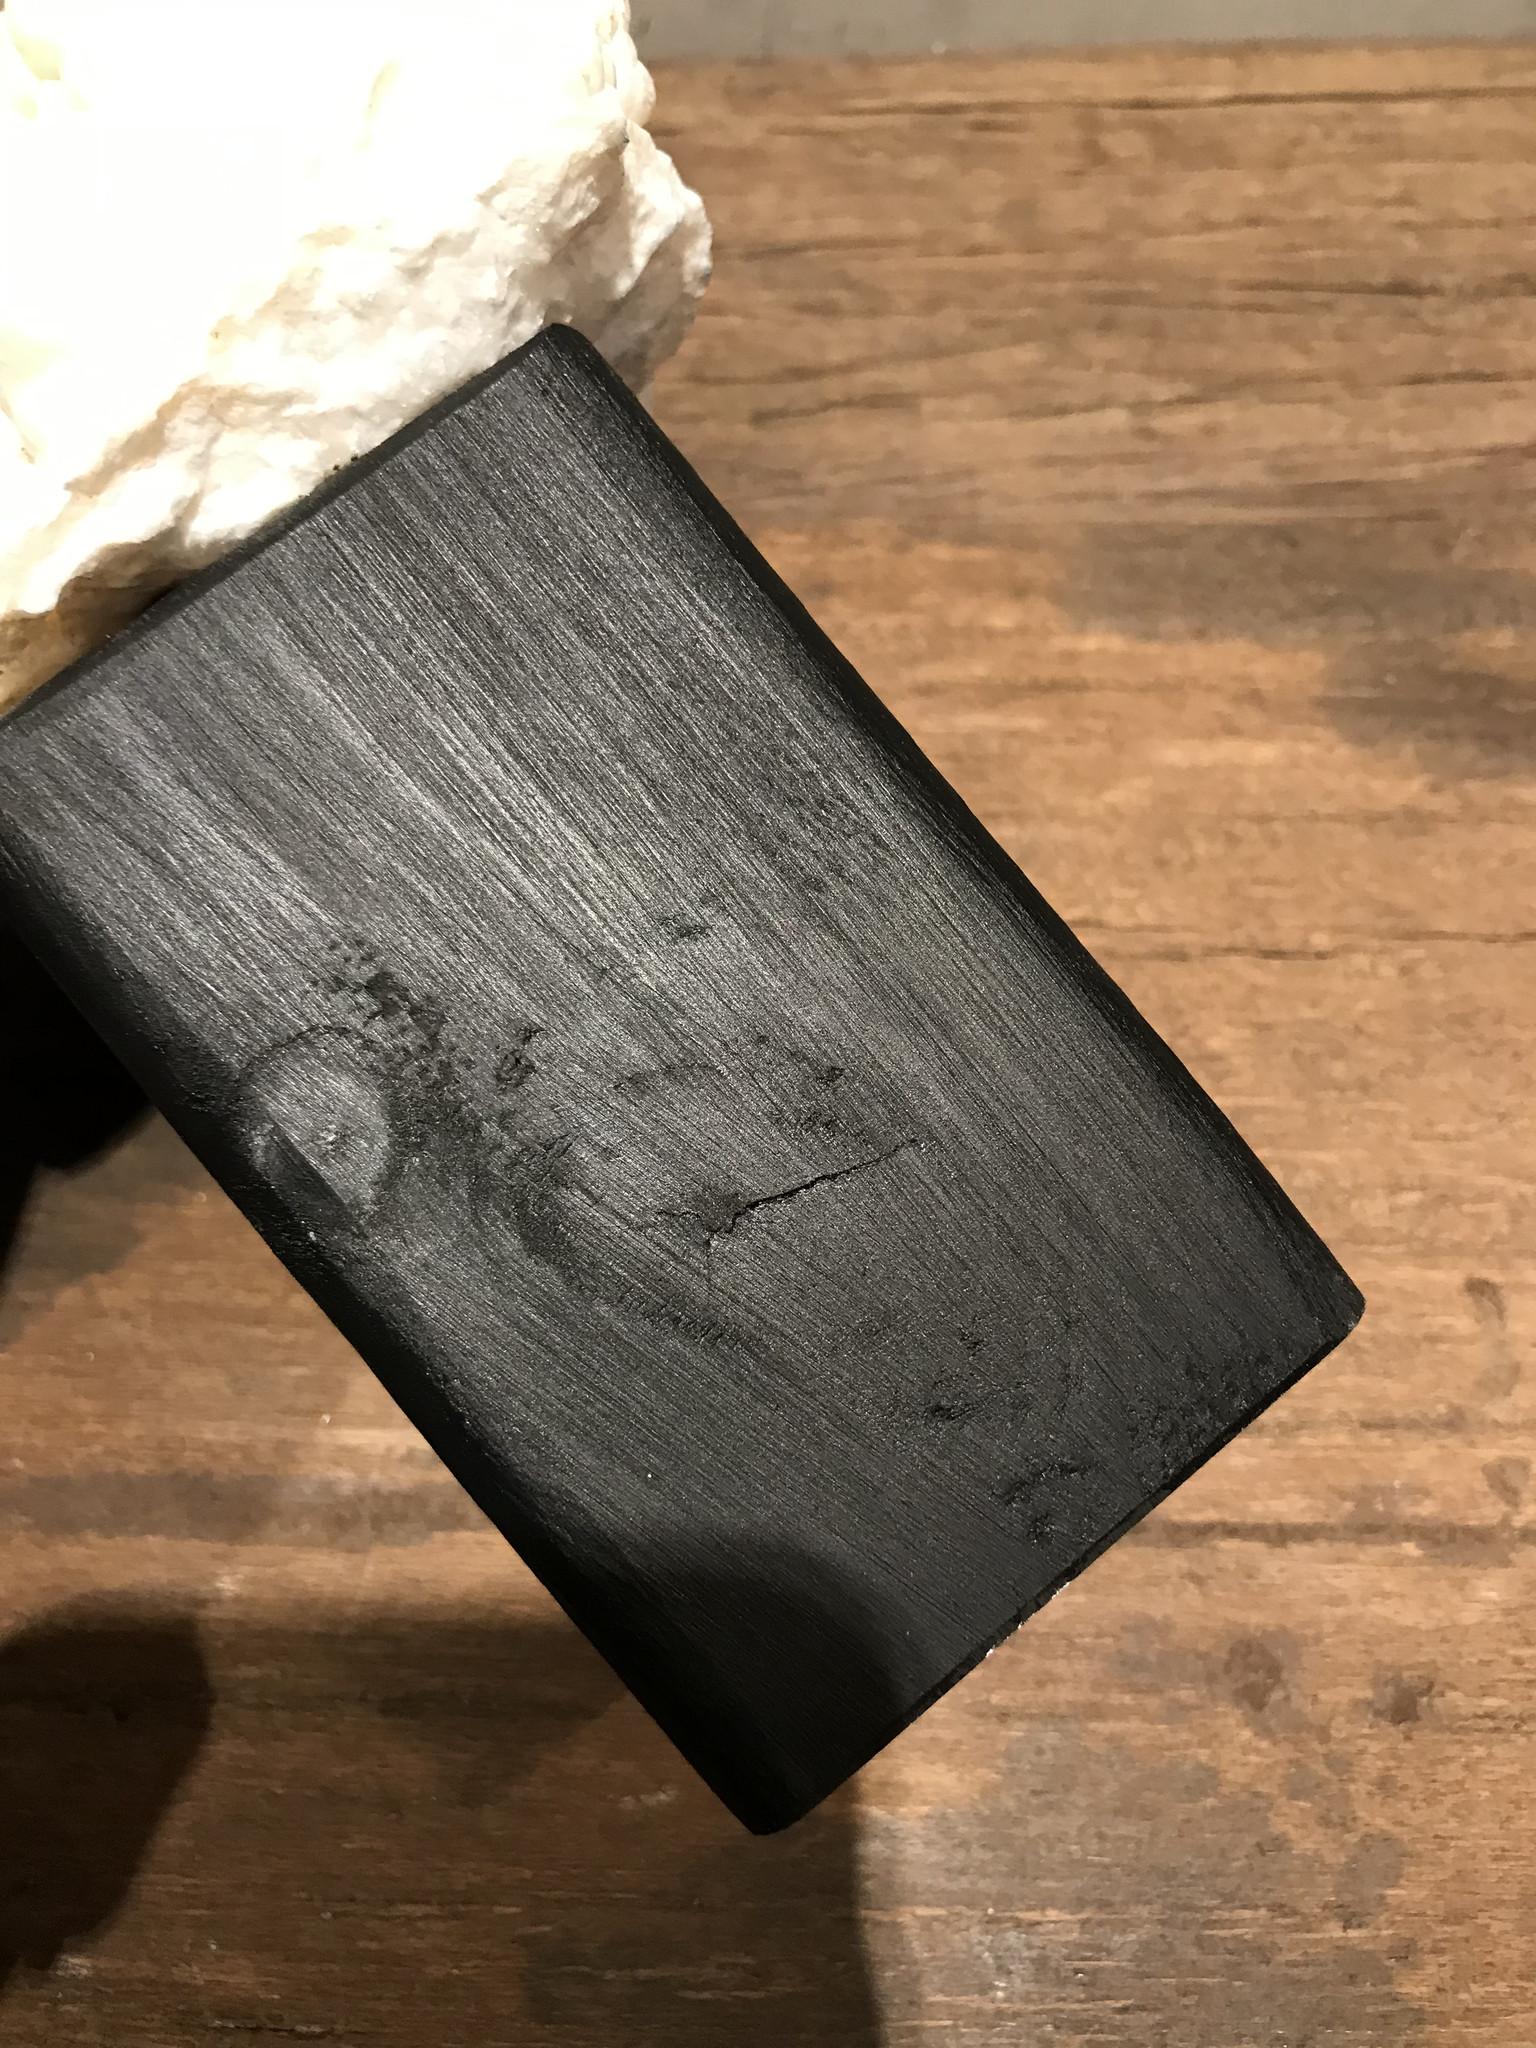 Stenen koraal op hout